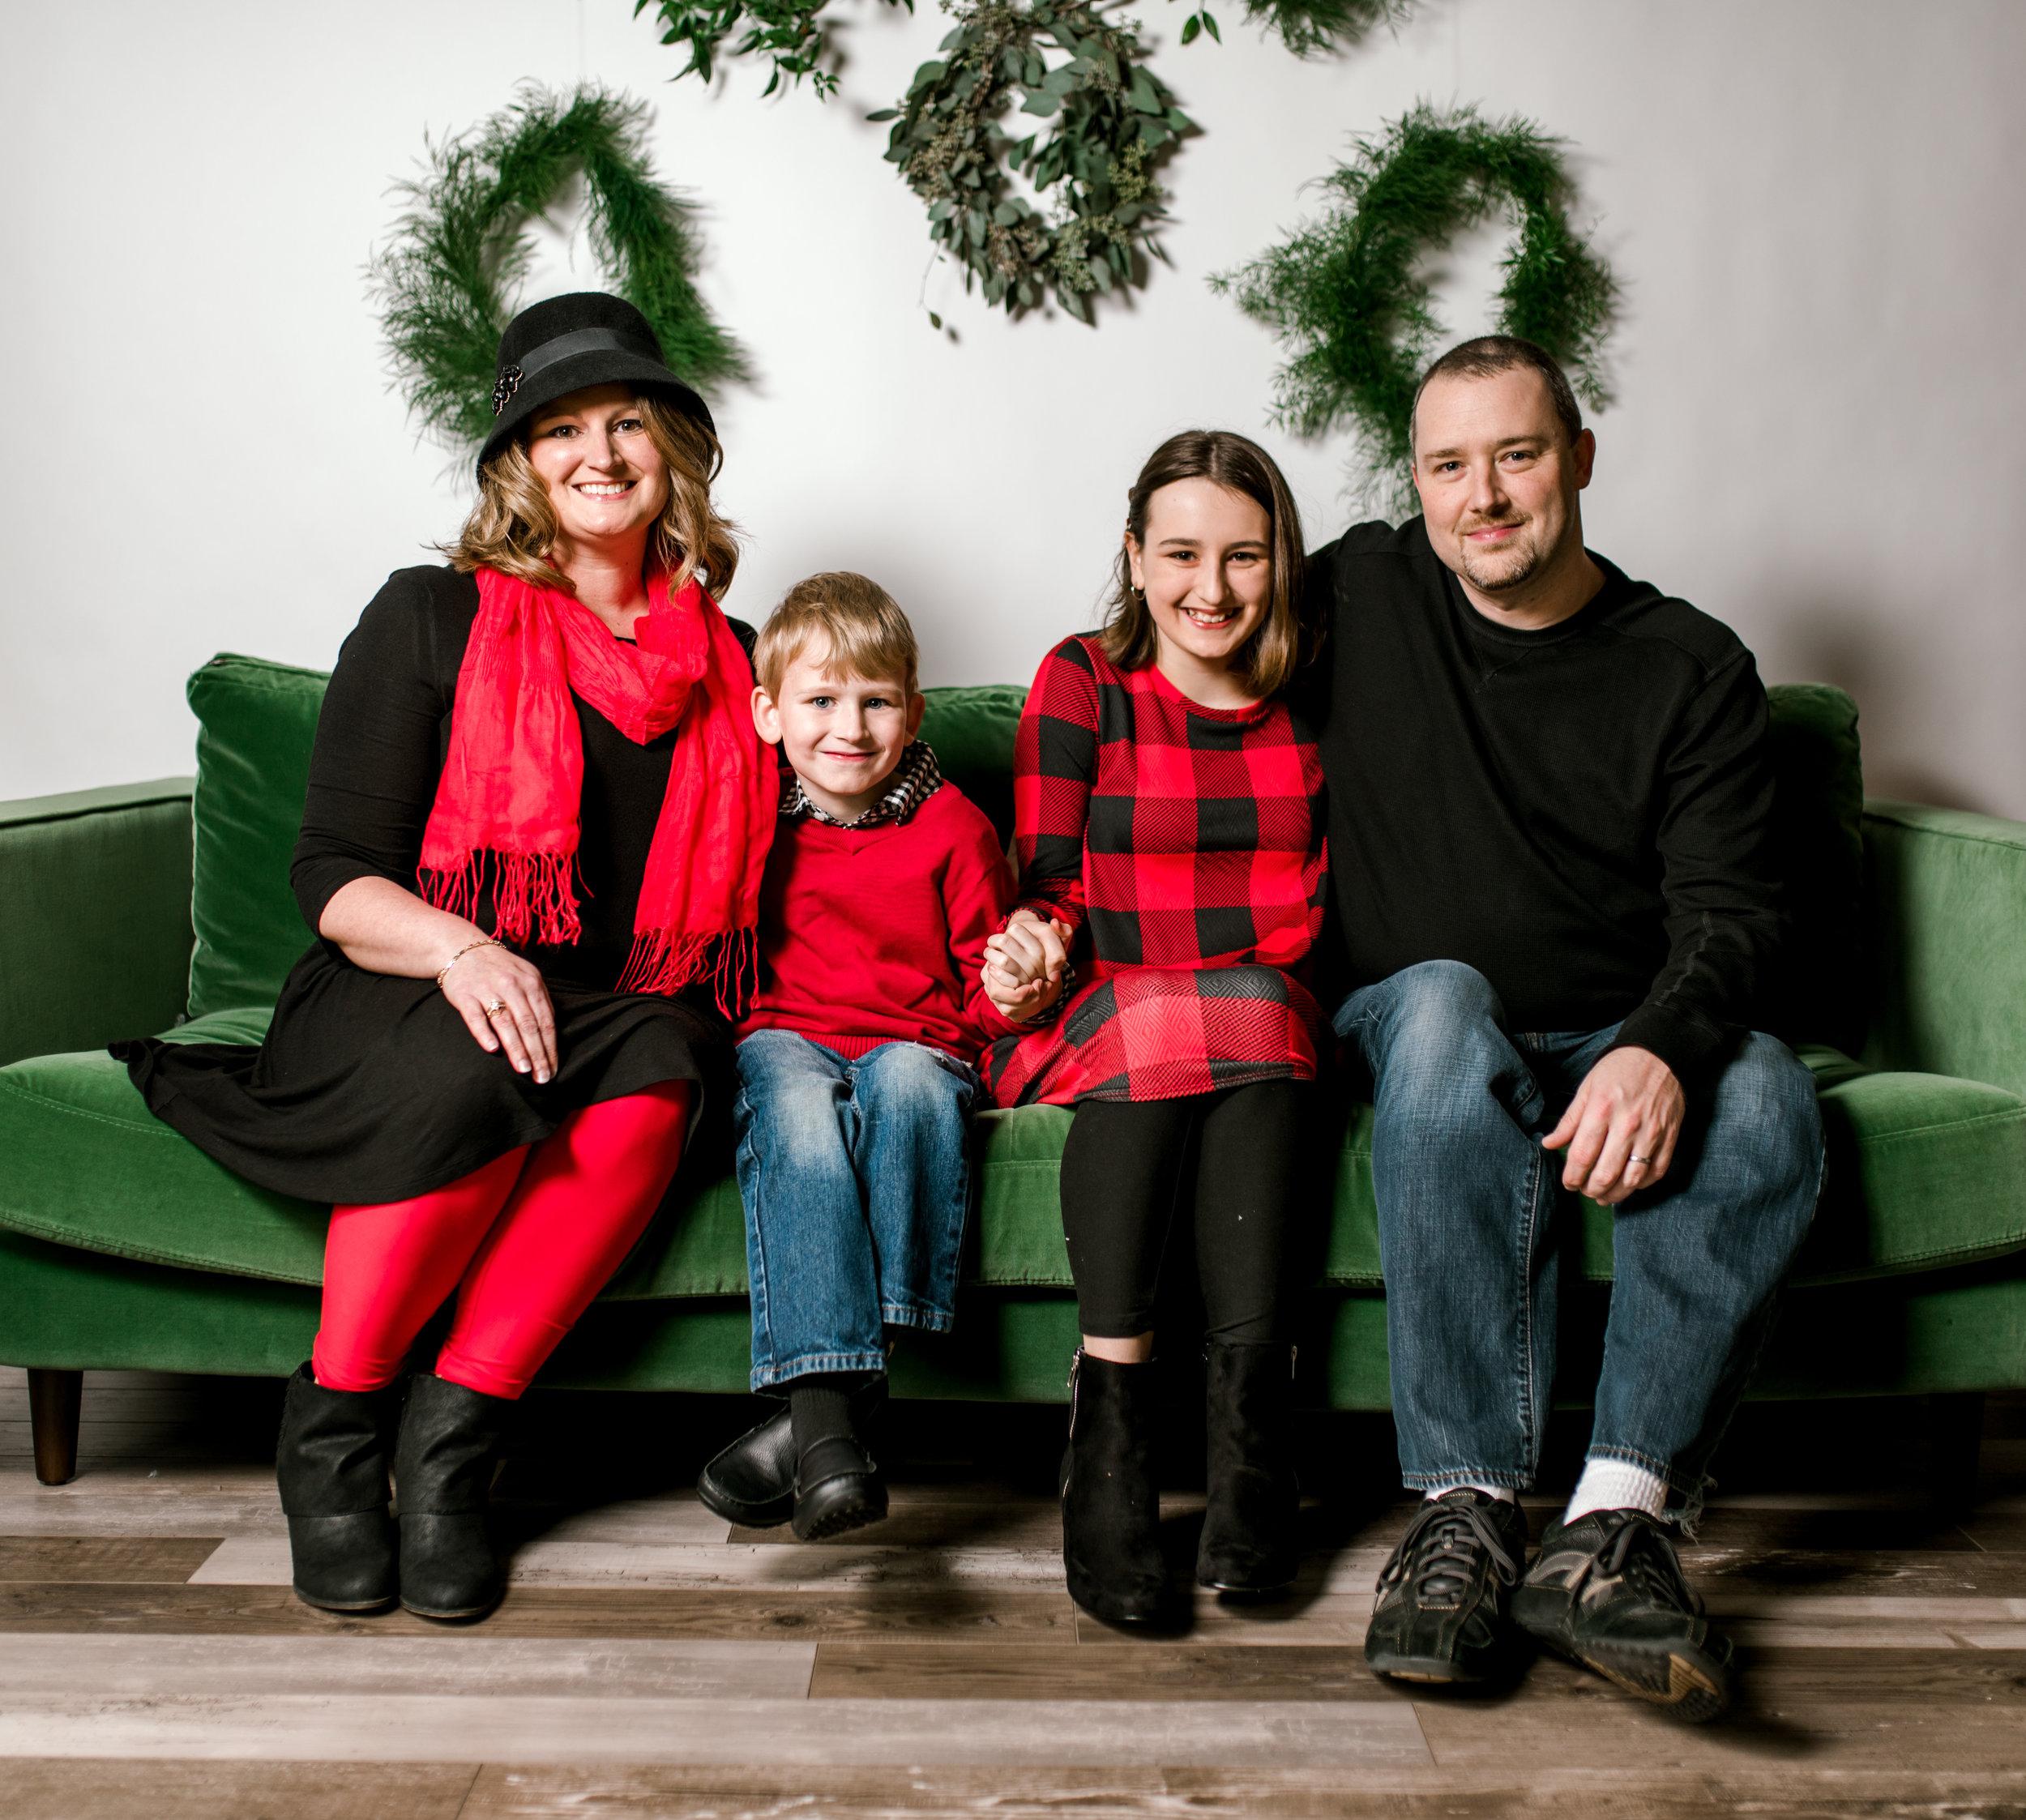 kentucky-family-photographer-christmas